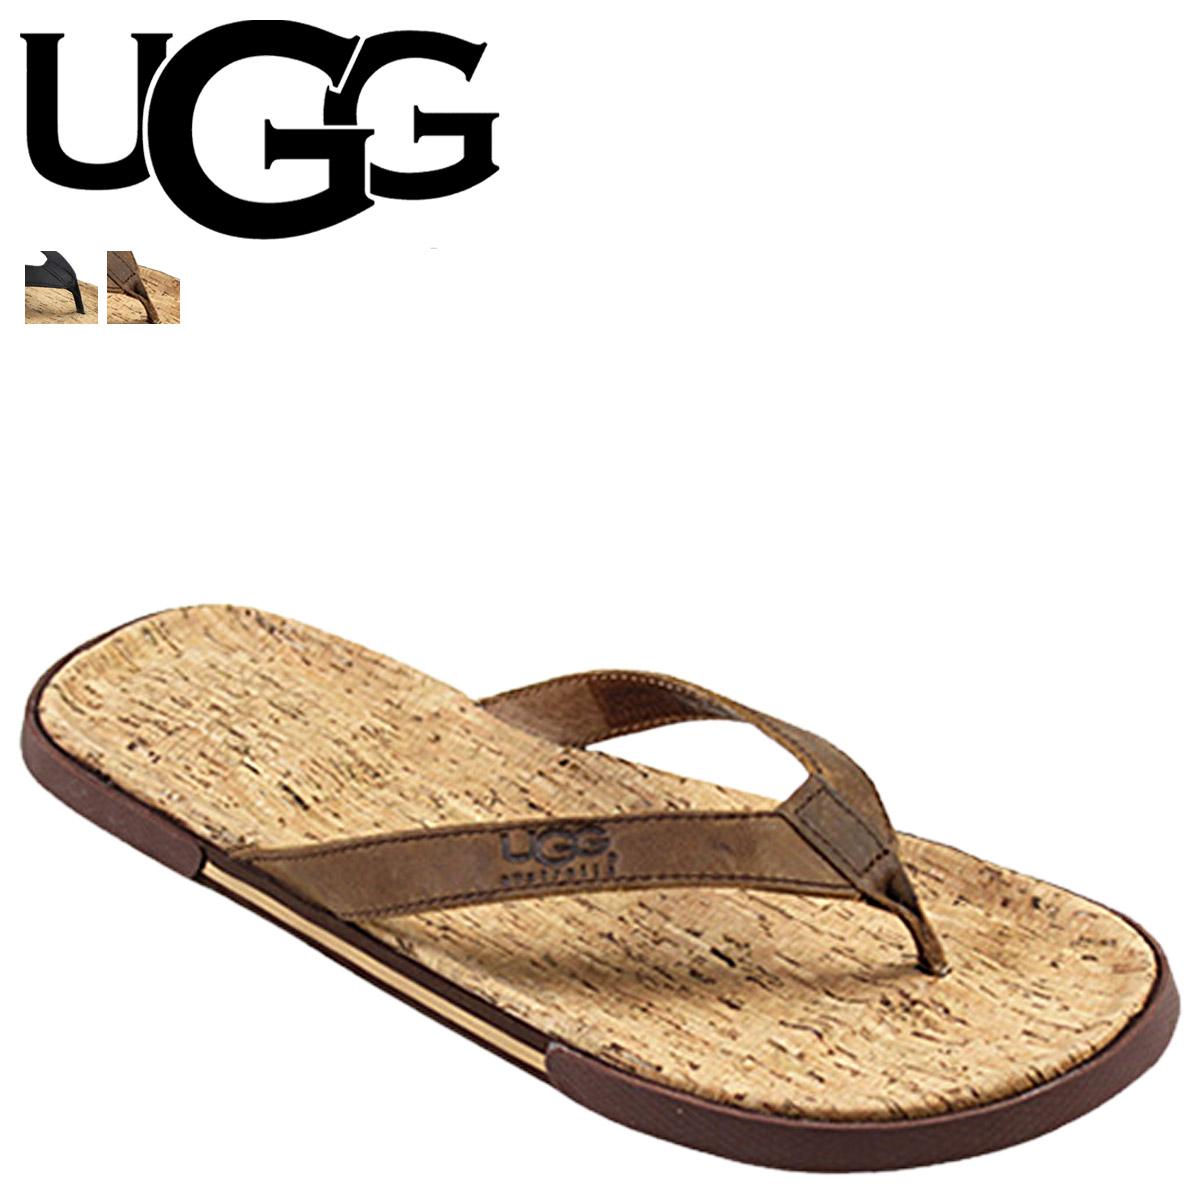 7ab9a5462 Whats up Sports   SOLD OUT  UGG UGG men s Bennison 2 Cork sandal ...